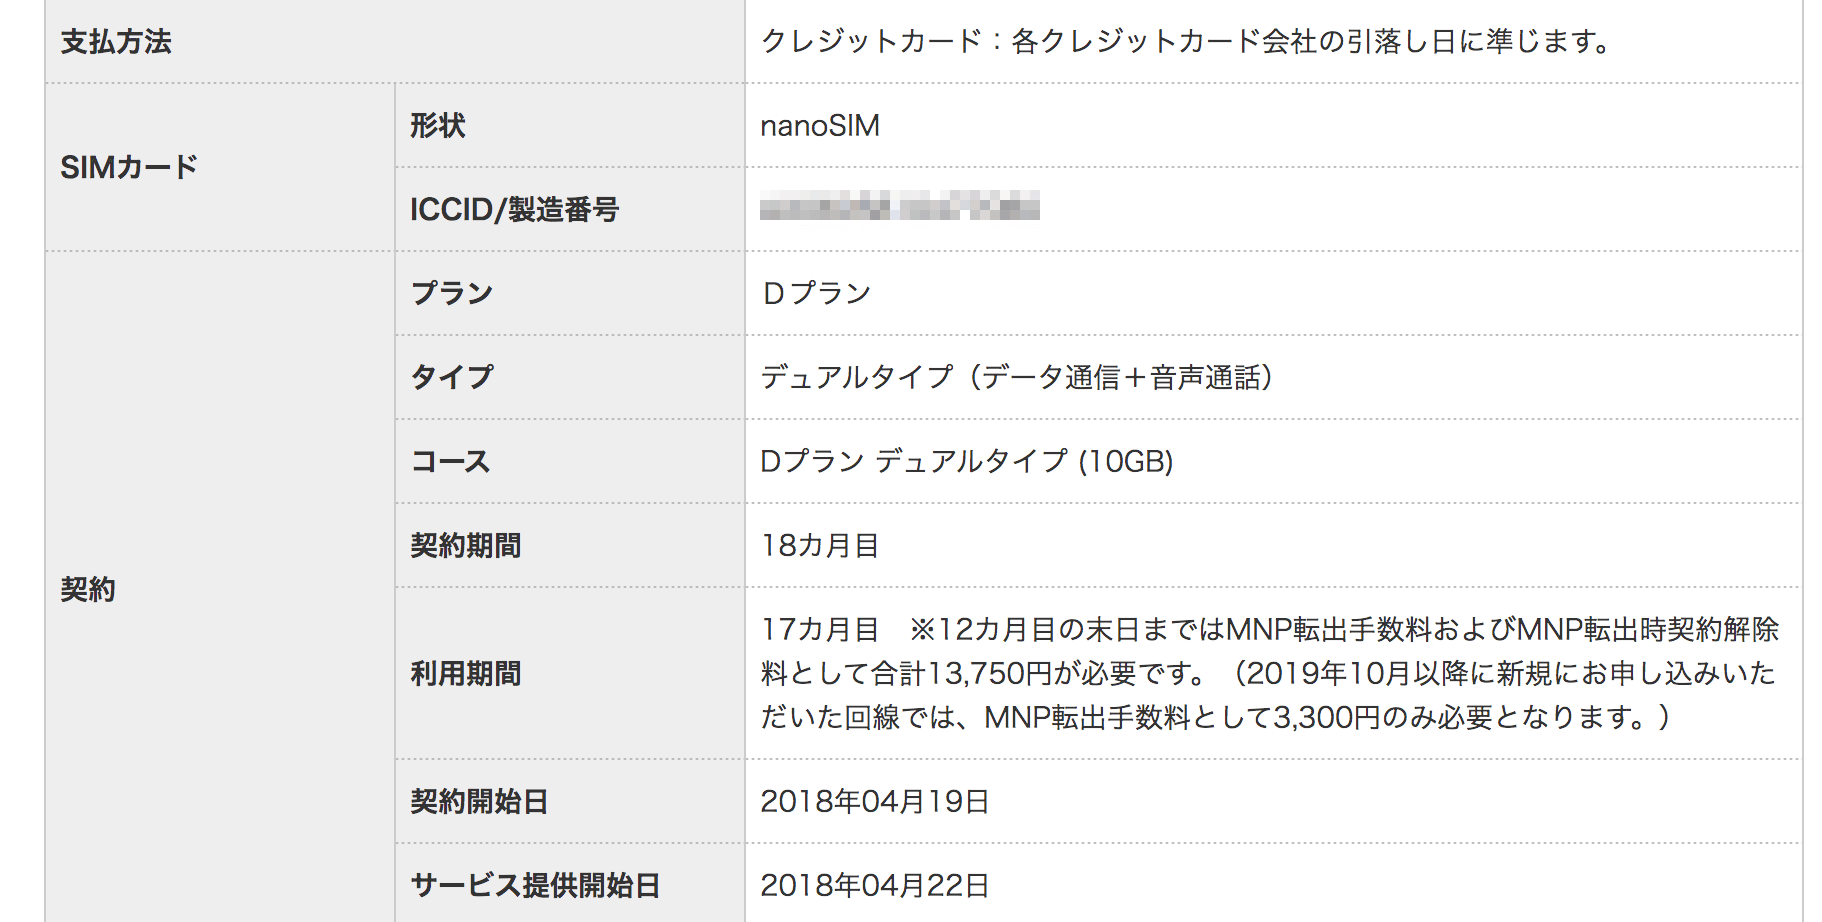 mineoの2019年9月時点の契約情報